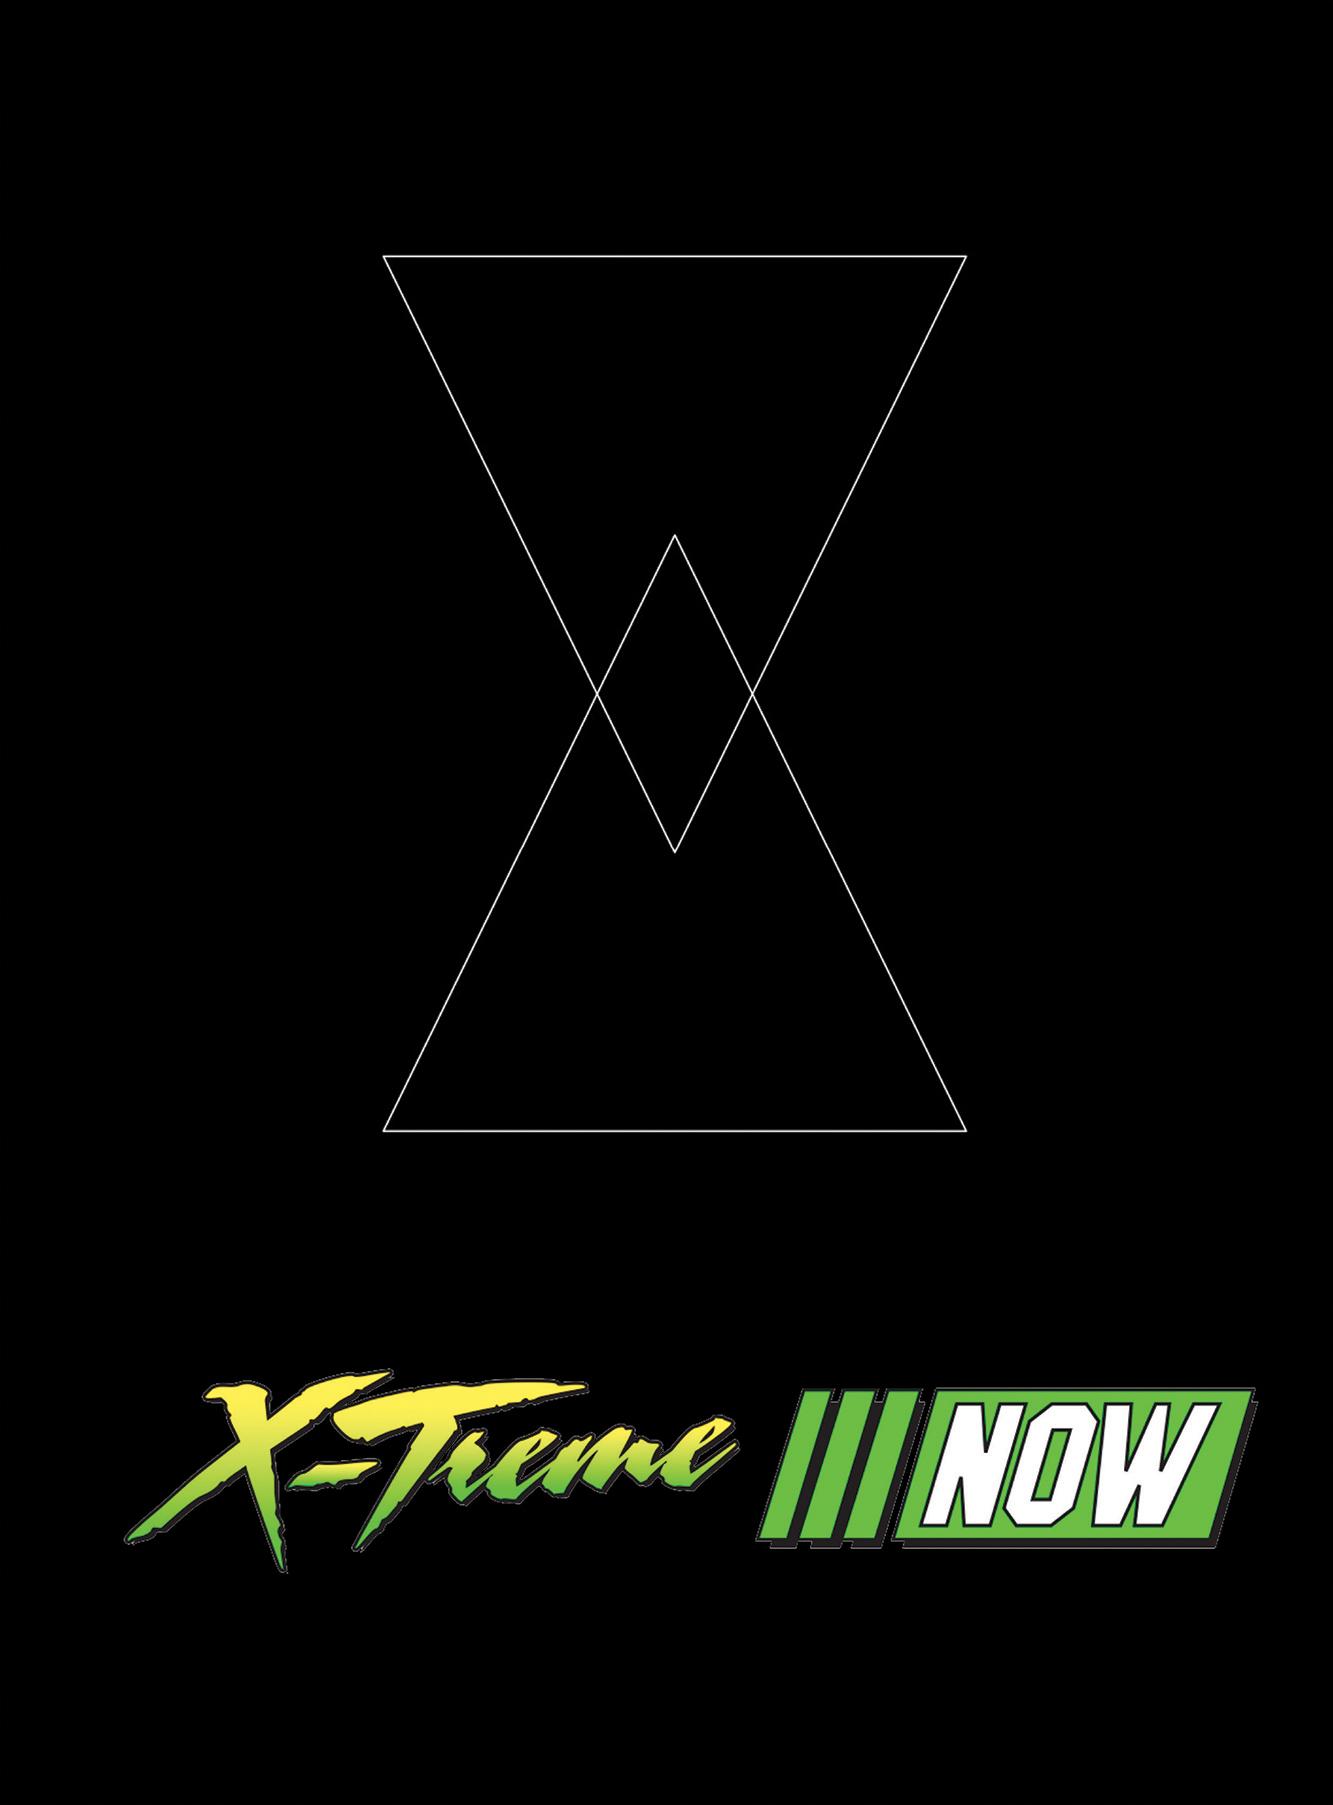 XTREMENOW-back.jpg